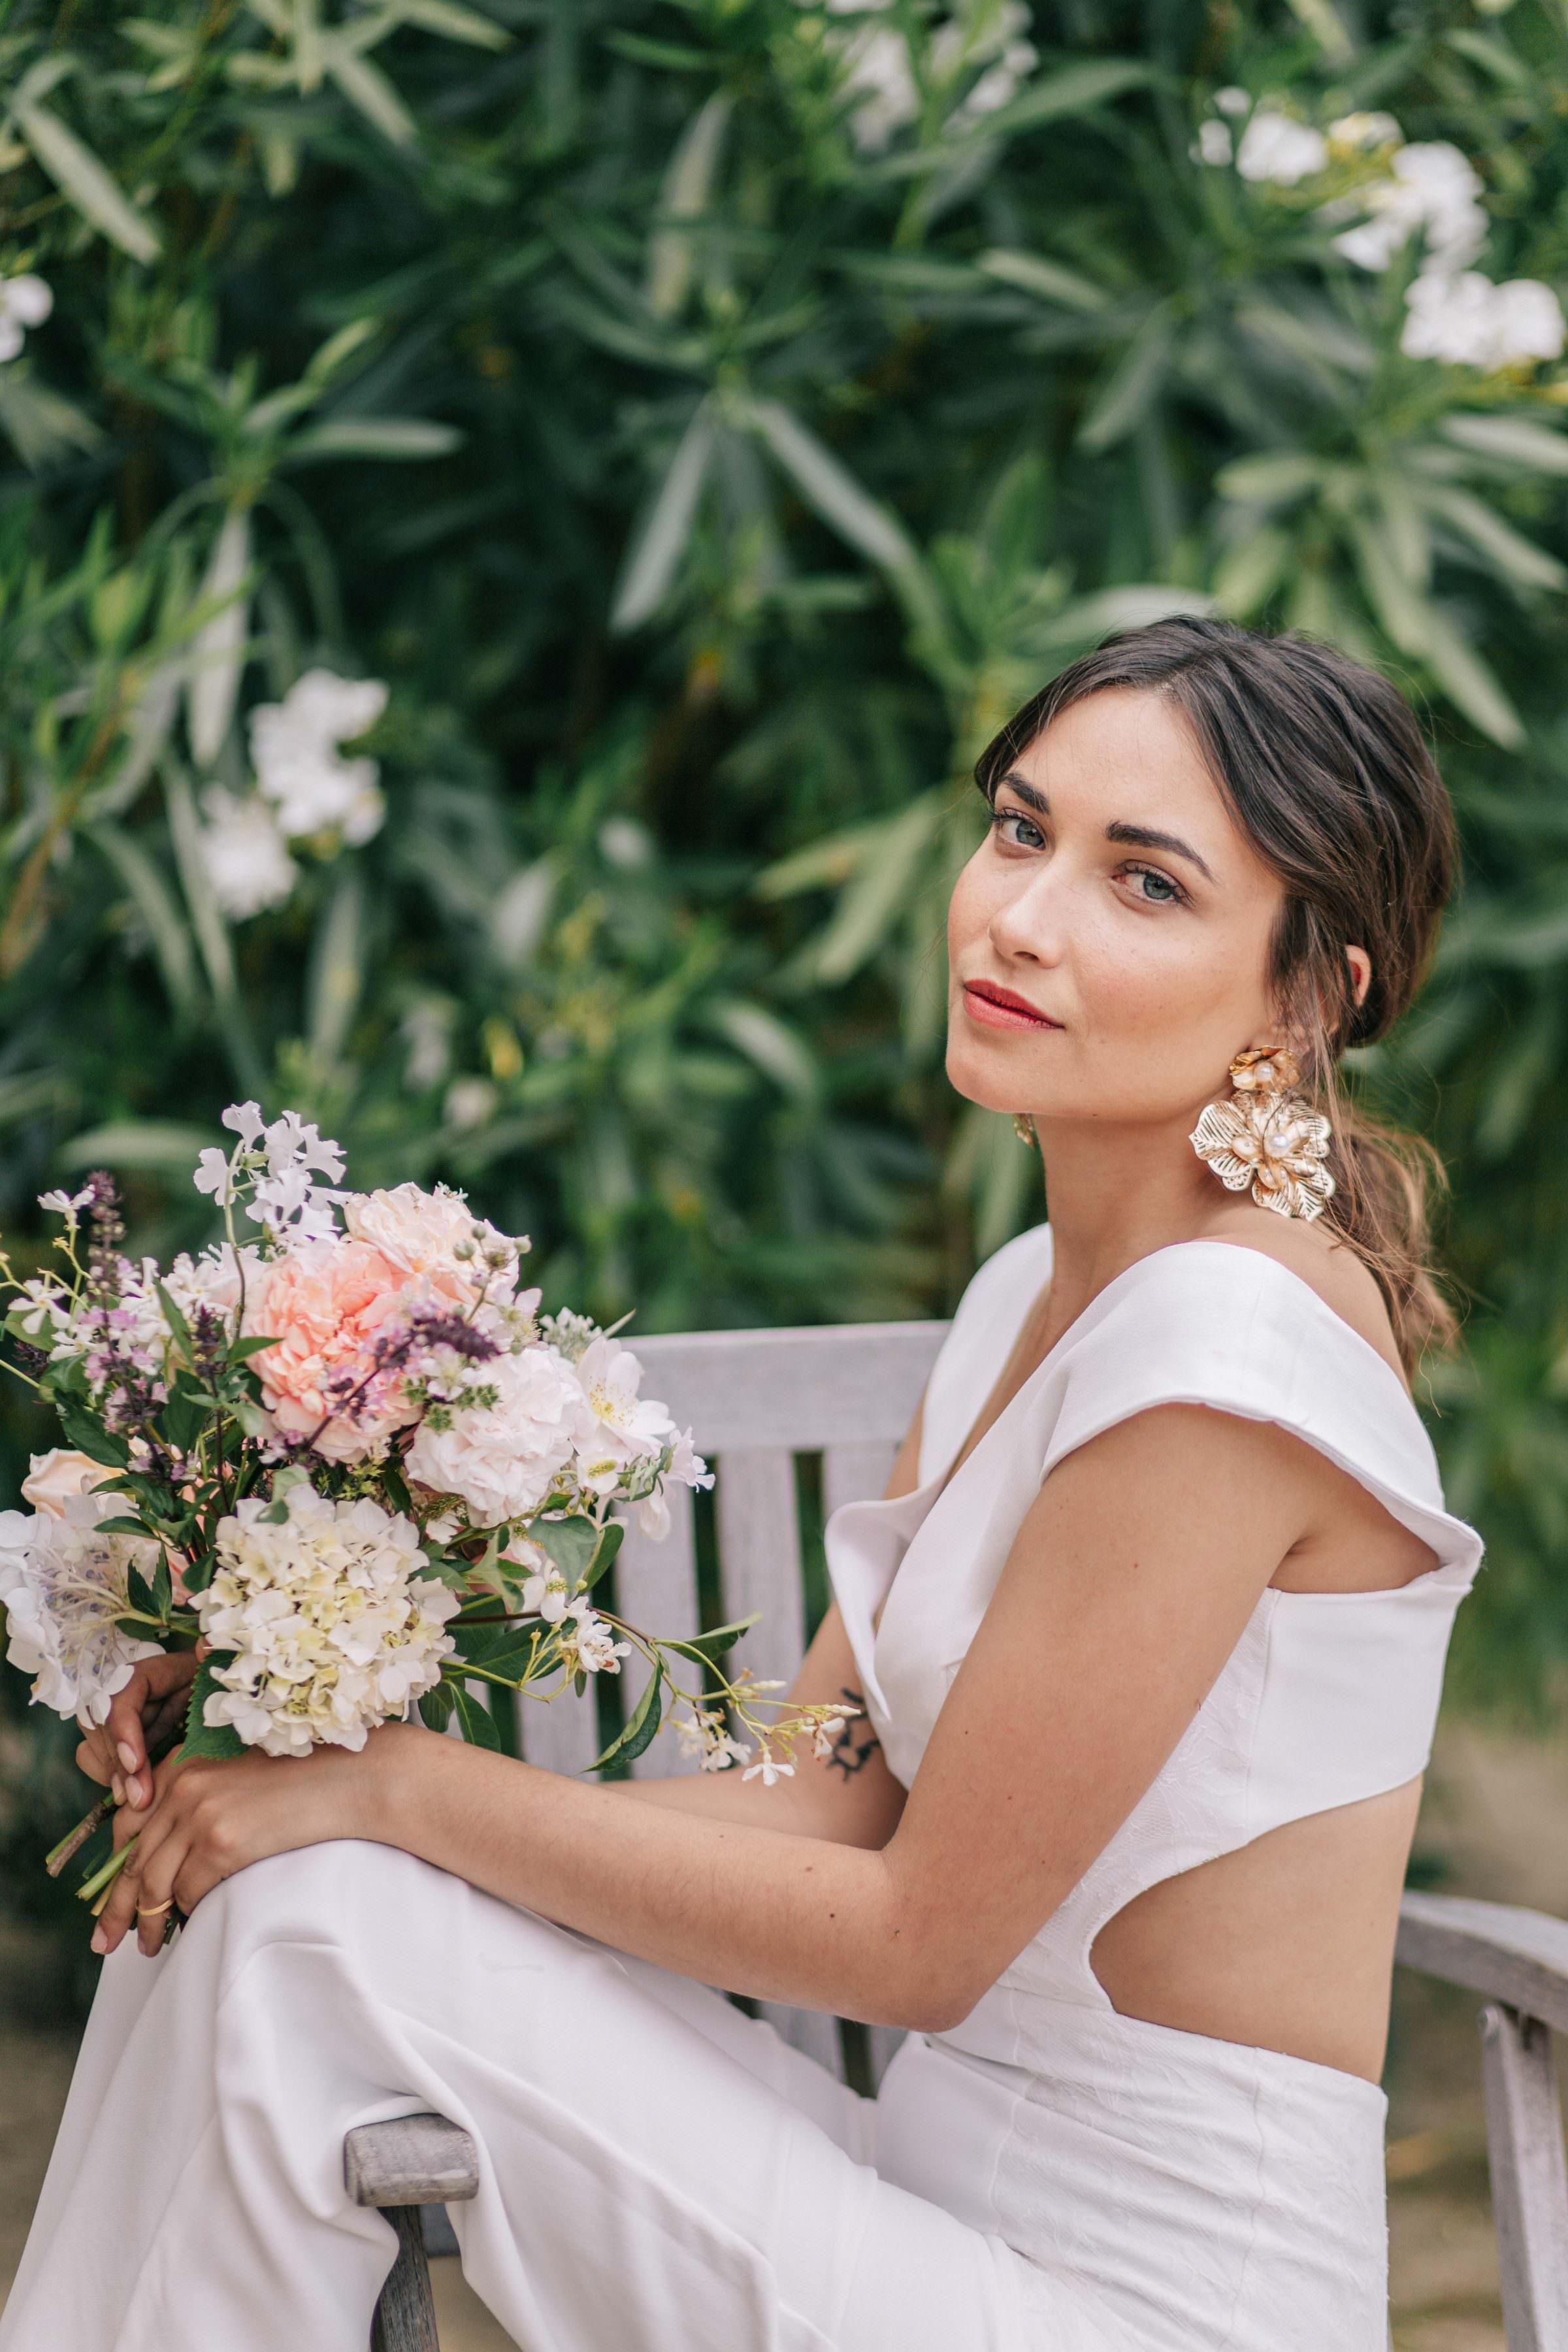 bridal portrait- photo by Amandine Ropars, france